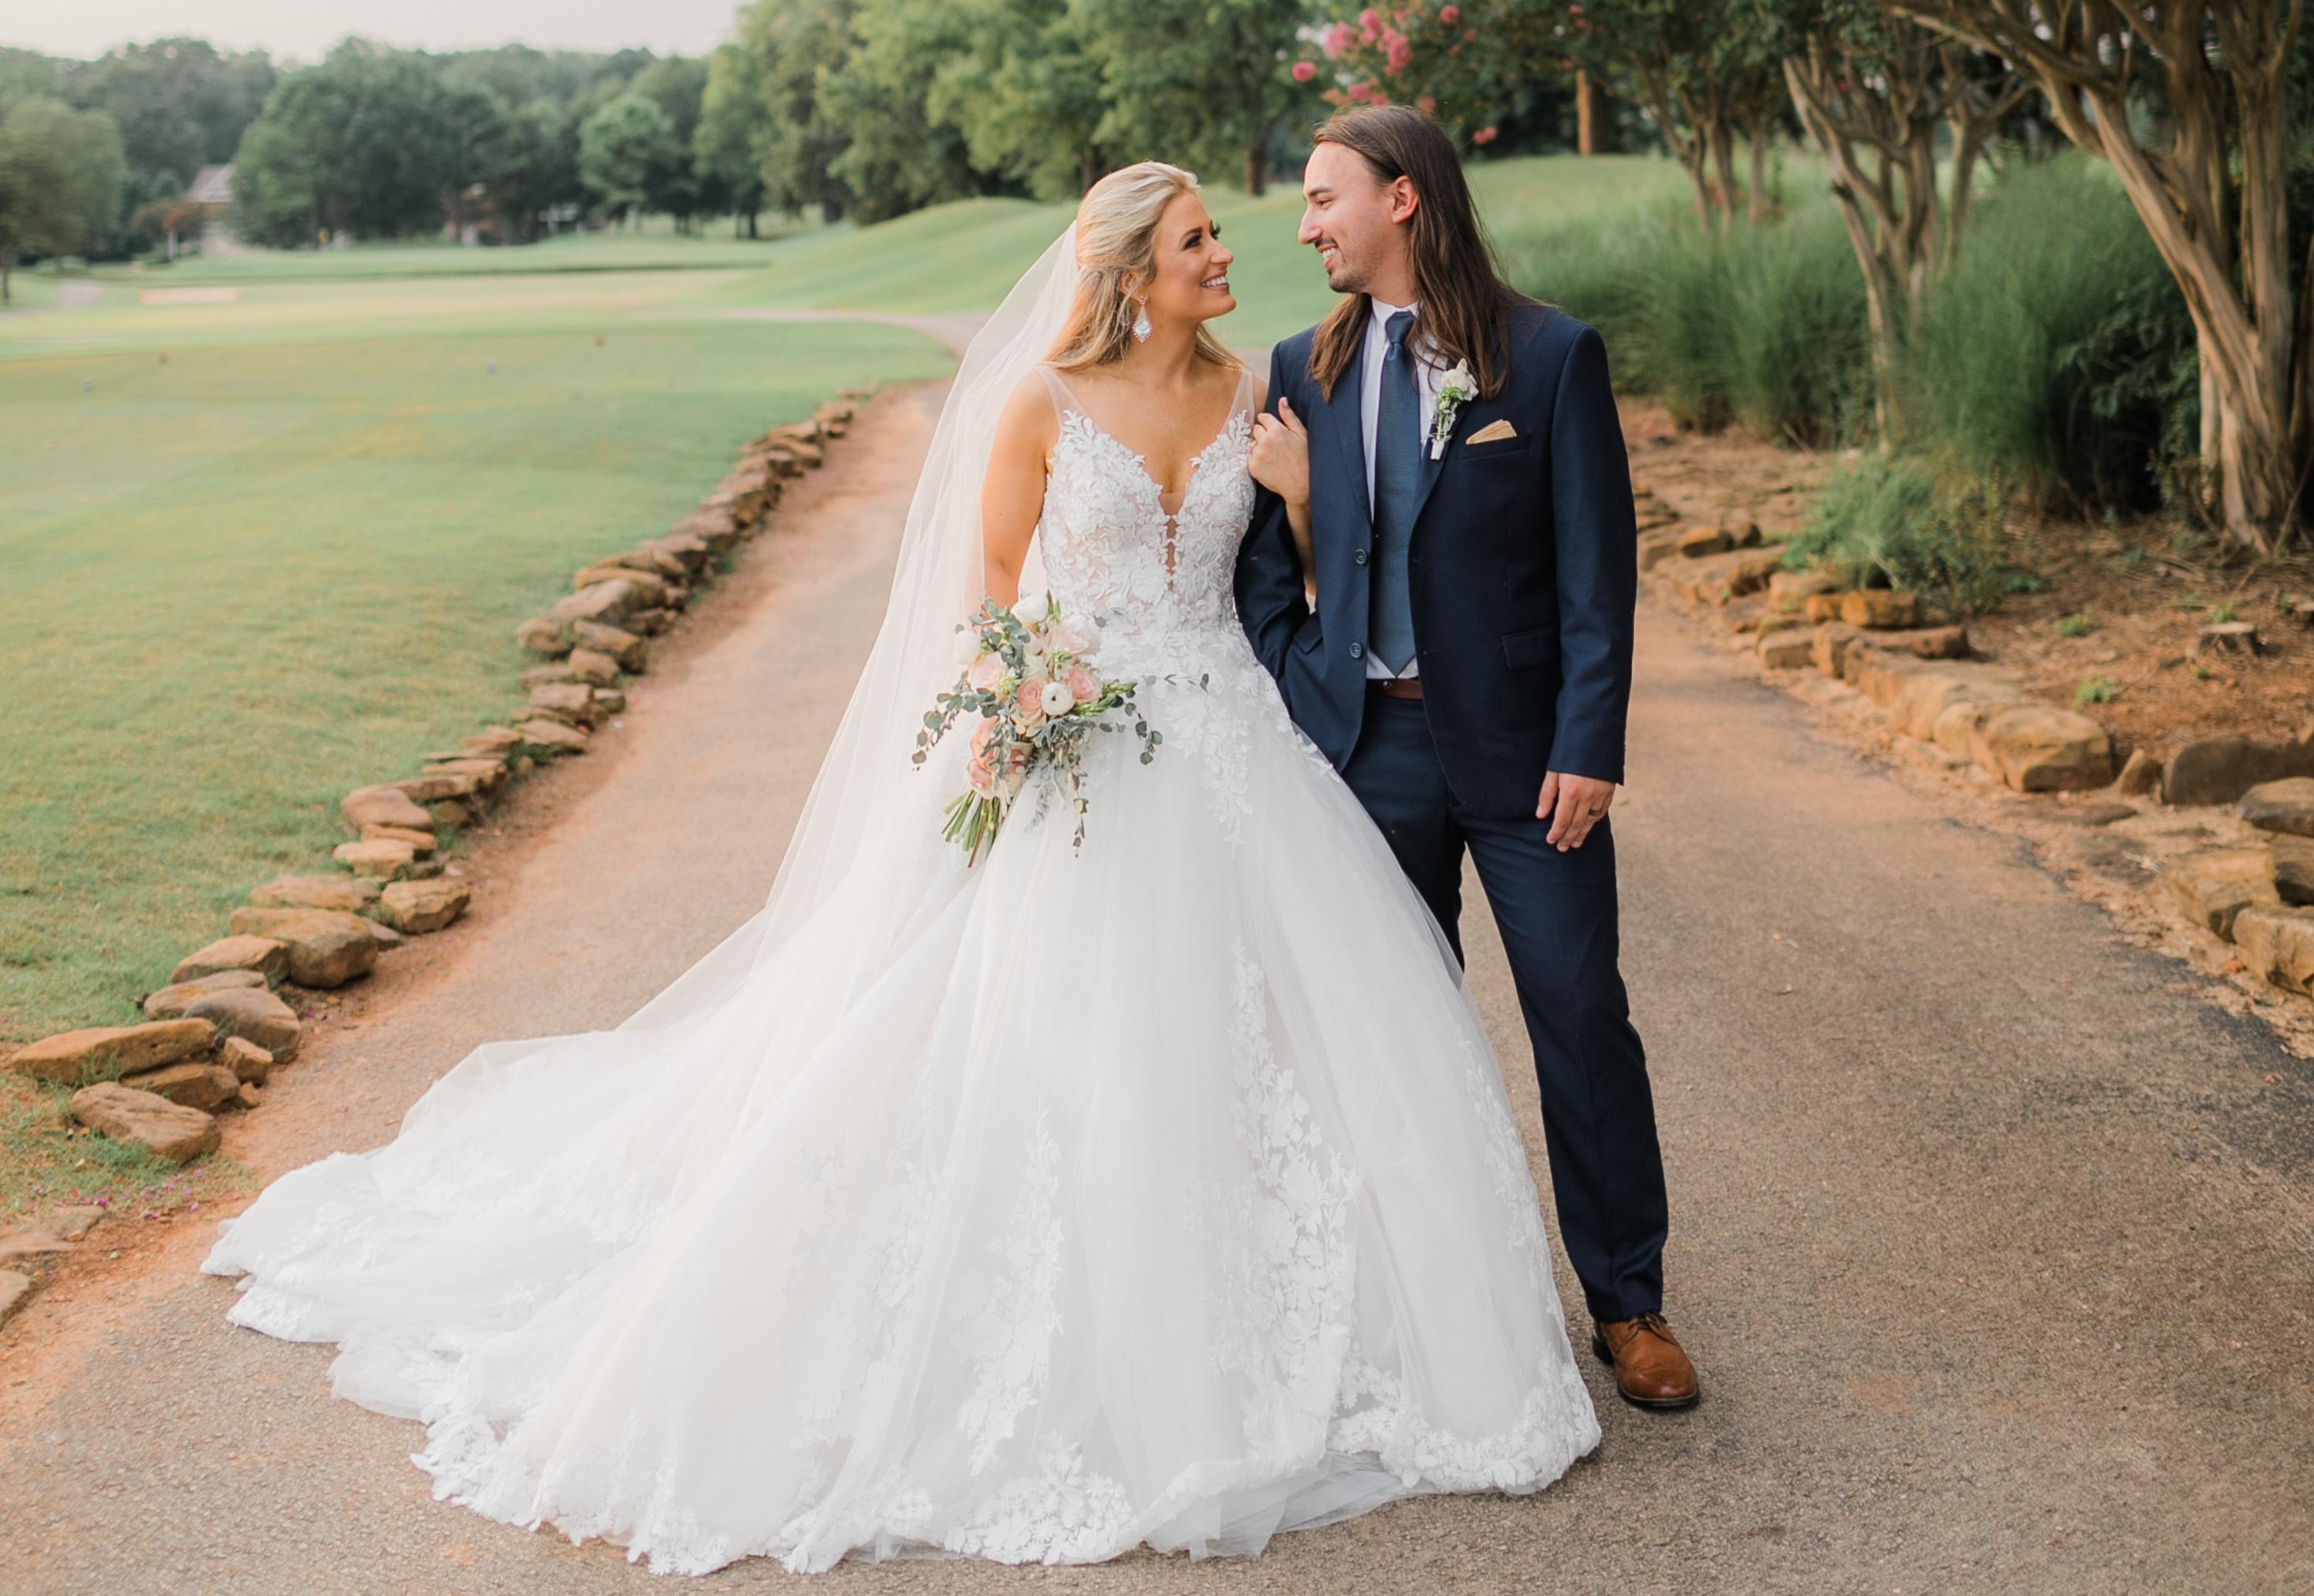 Rachel Wammack S Wedding Dress Designer Talks About Creating The Singer S Dream Dress Sounds Like Nashville